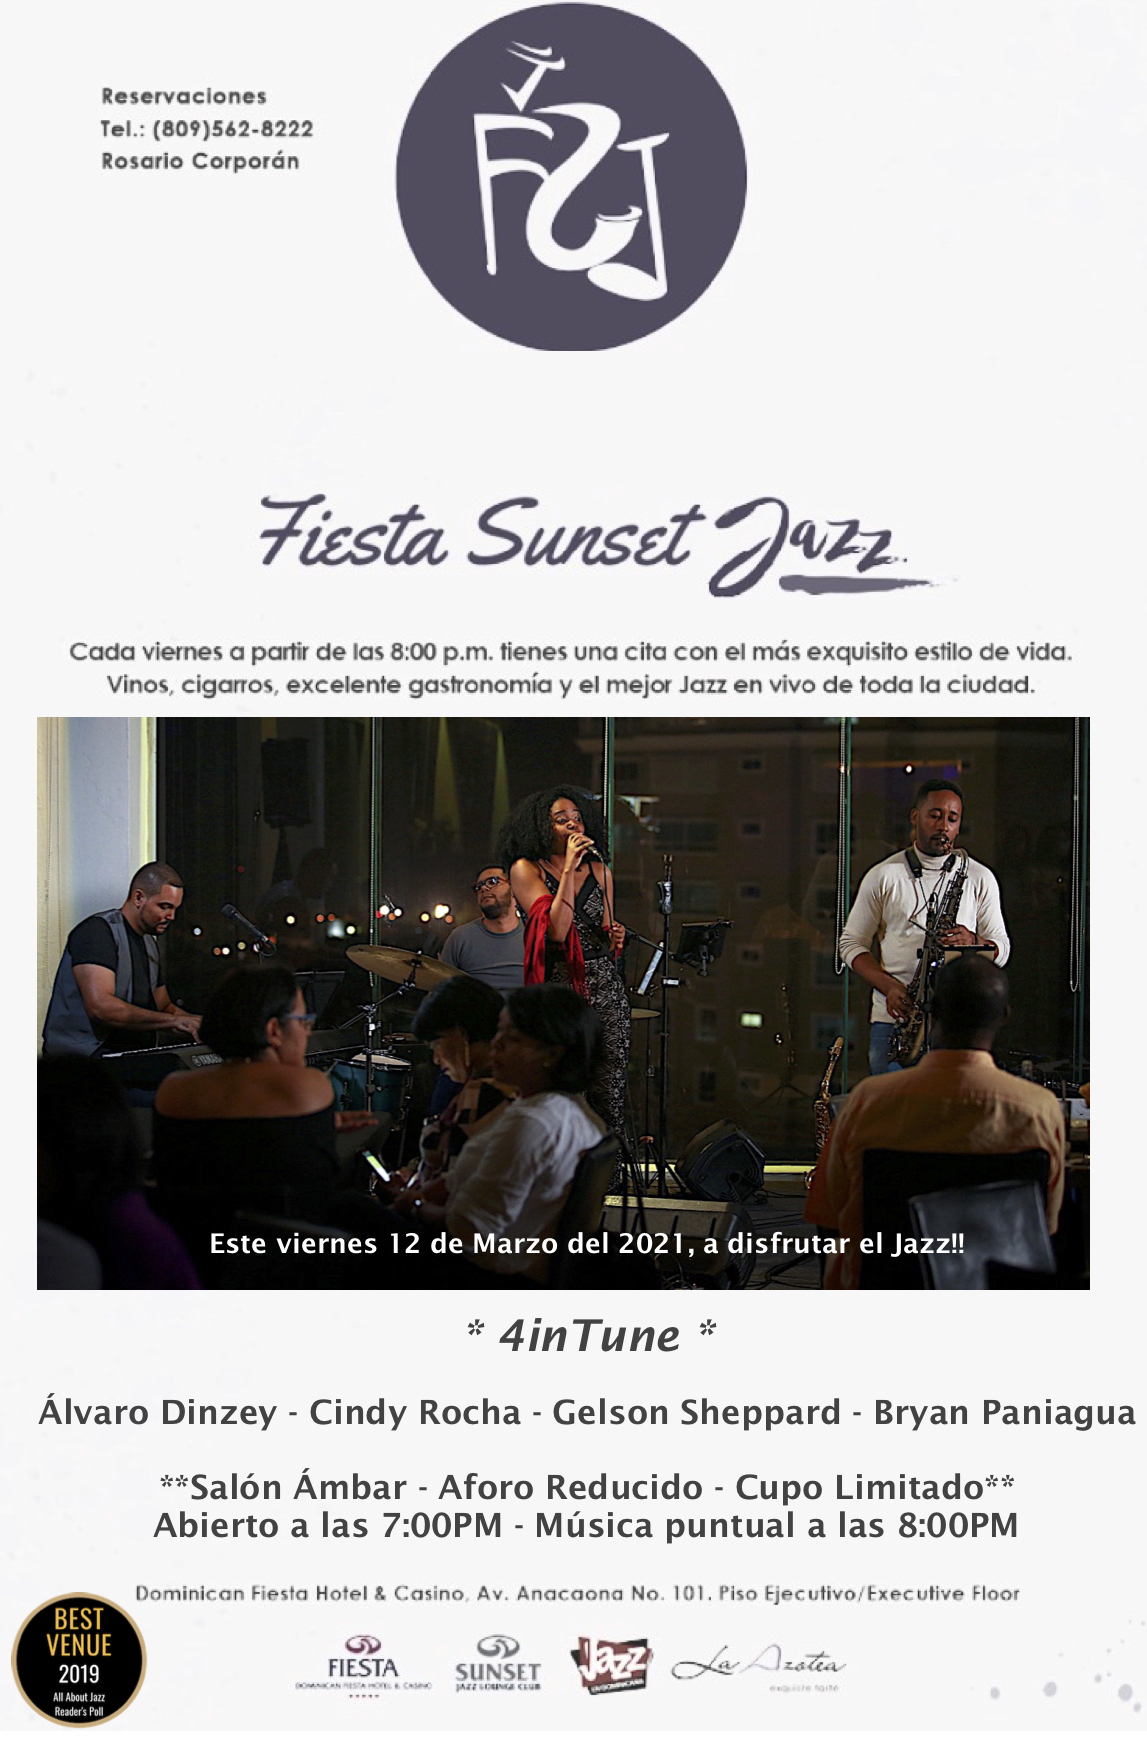 Fiesta Sunset Jazz Presents 4intune